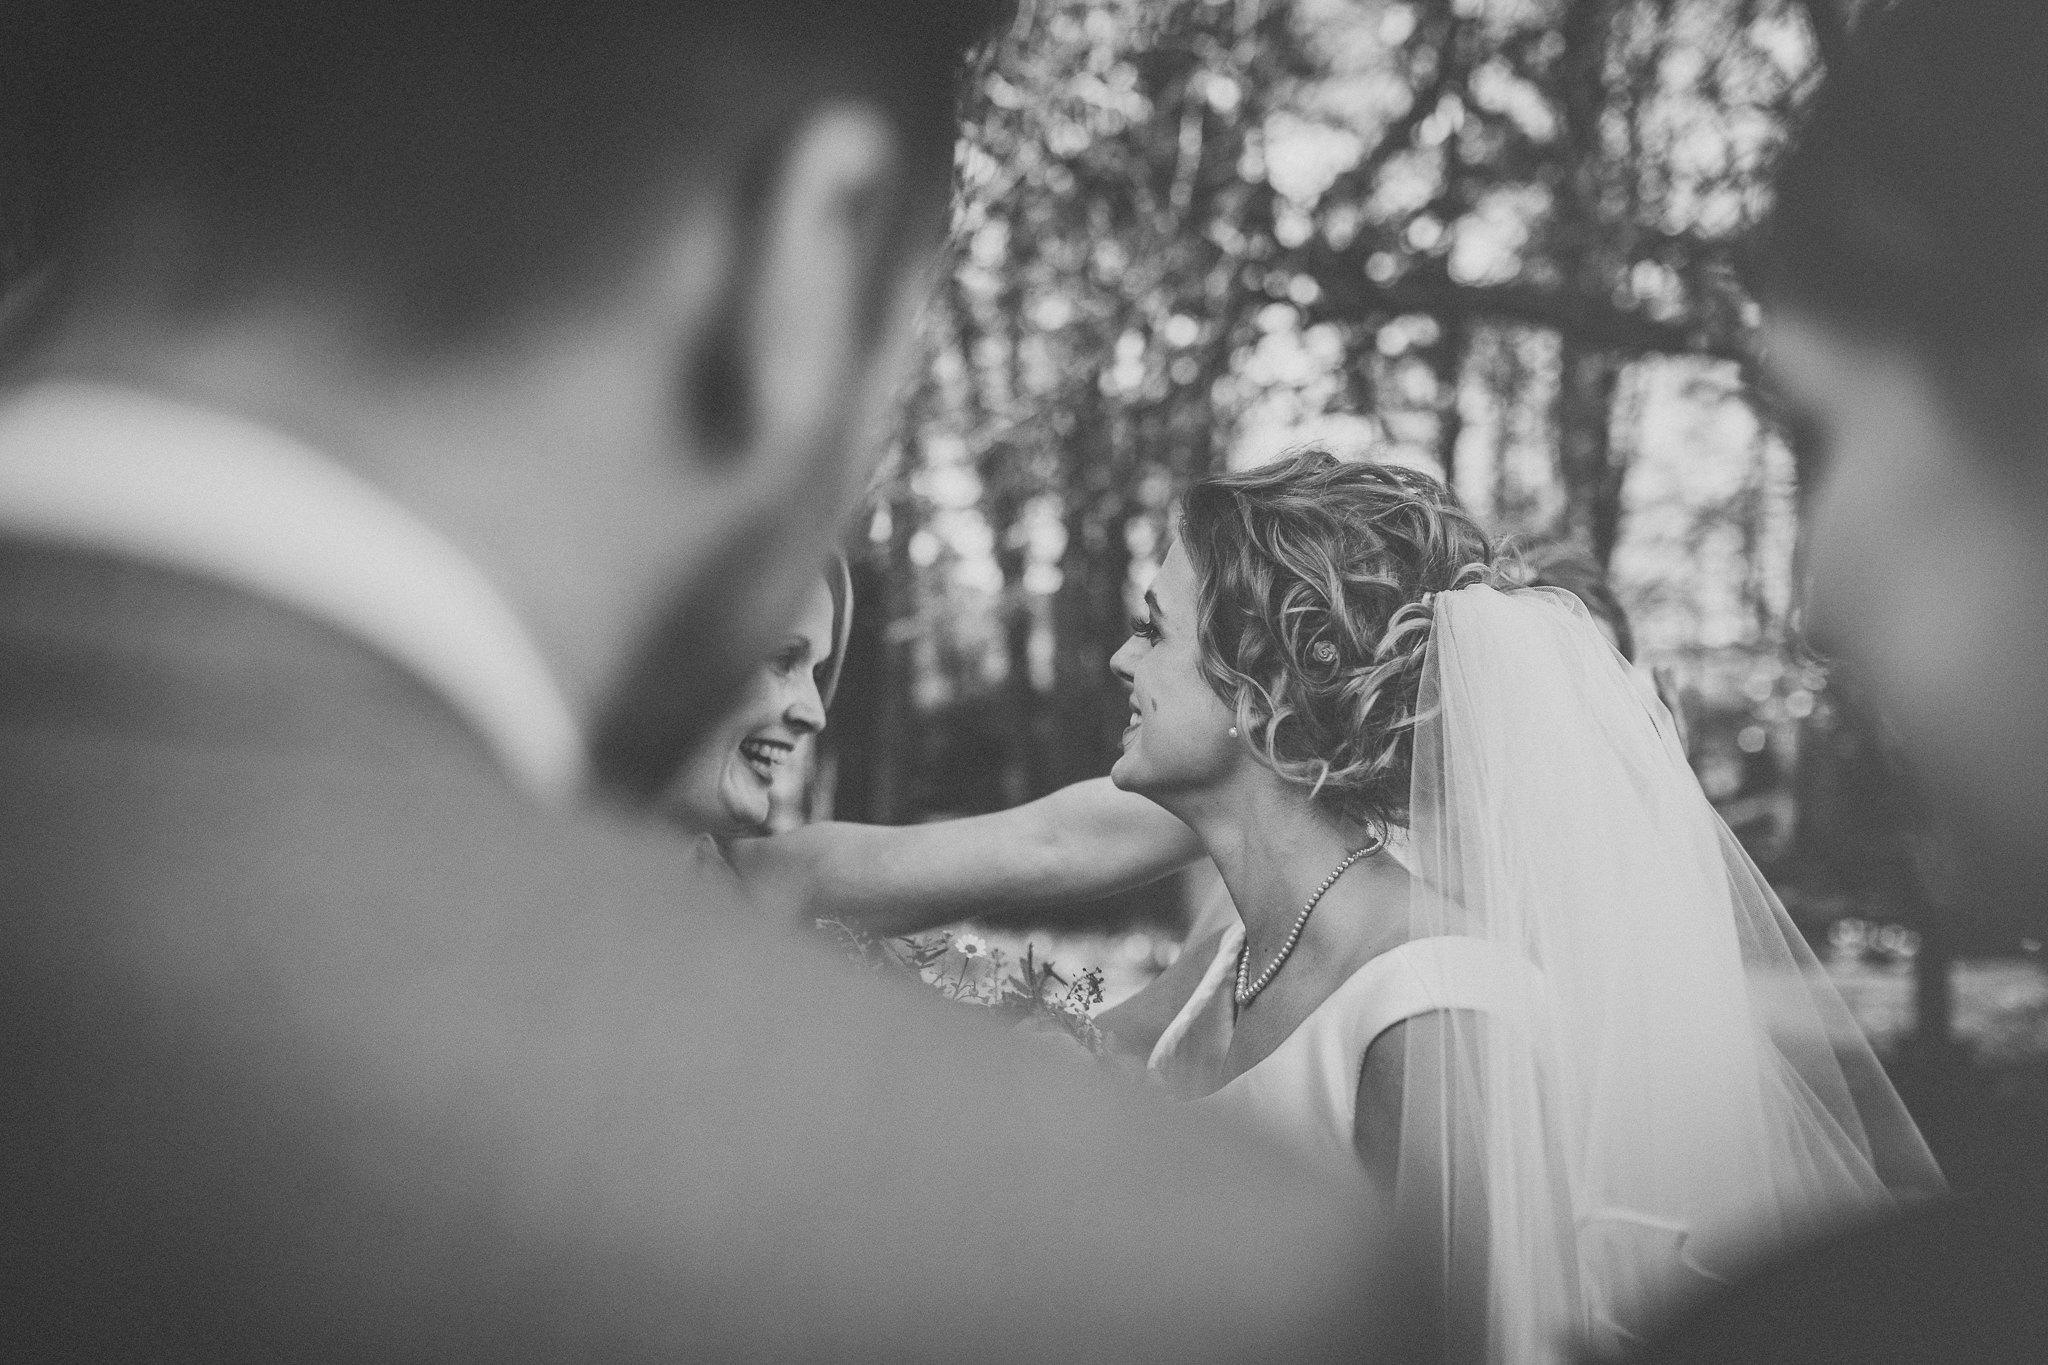 Lancashire-Creative-natural-documentary-wedding-photography-90047